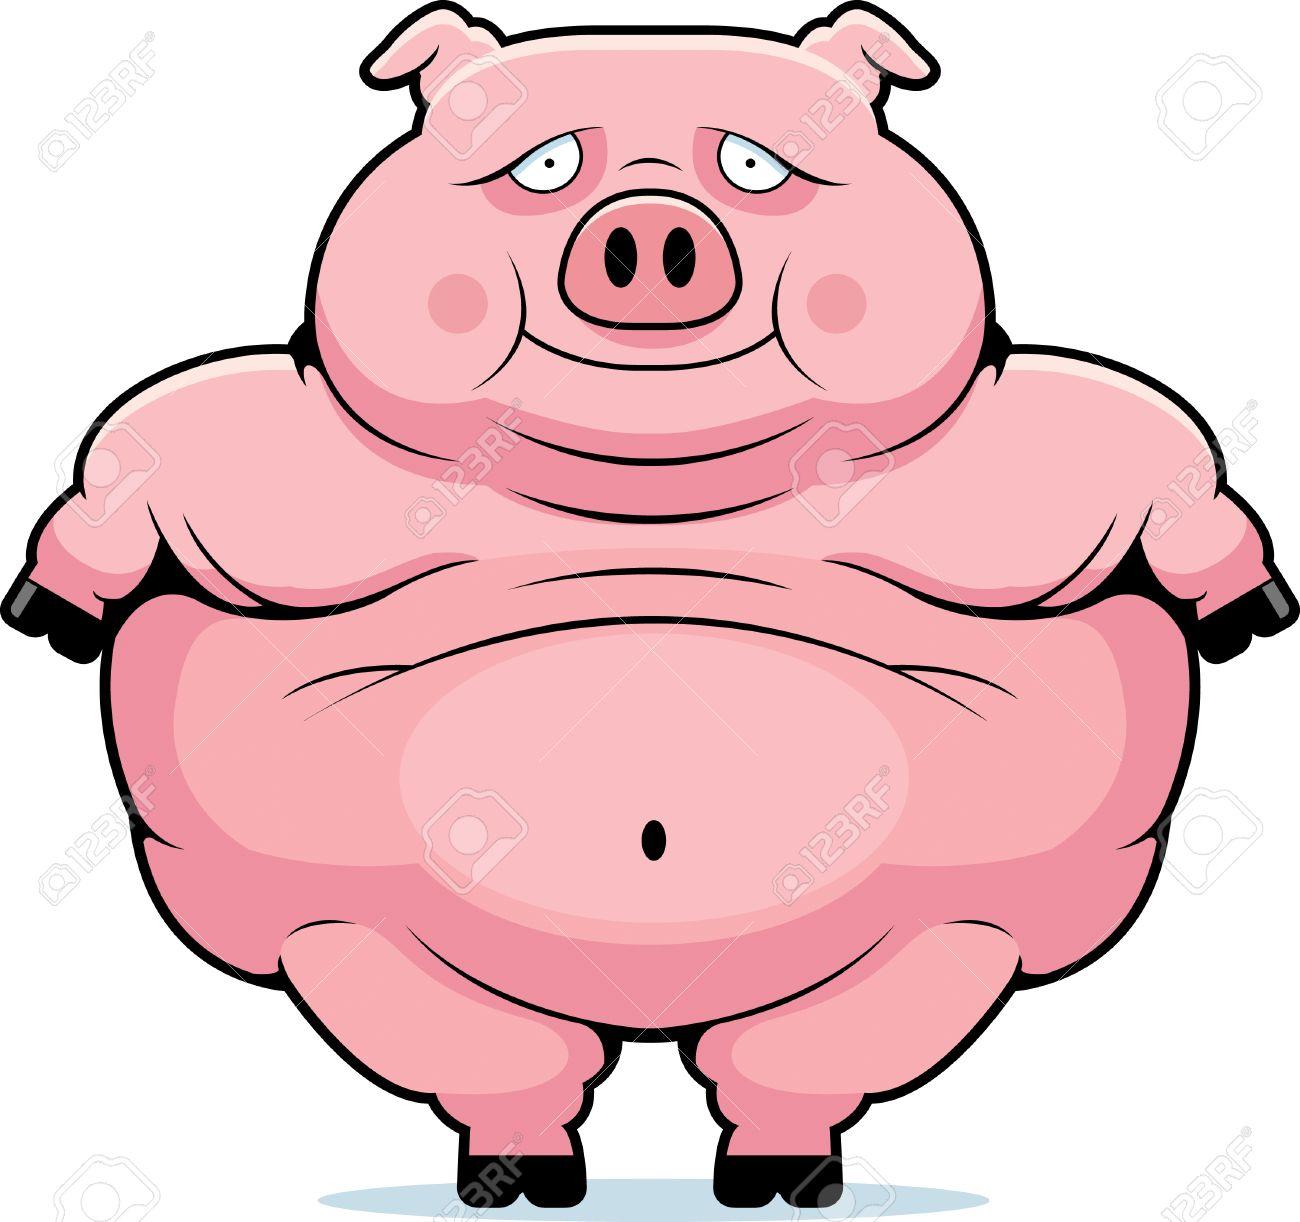 a happy cartoon fat pig standing and smiling royalty free cliparts rh 123rf com fat guinea pig cartoon cute fat pig cartoon